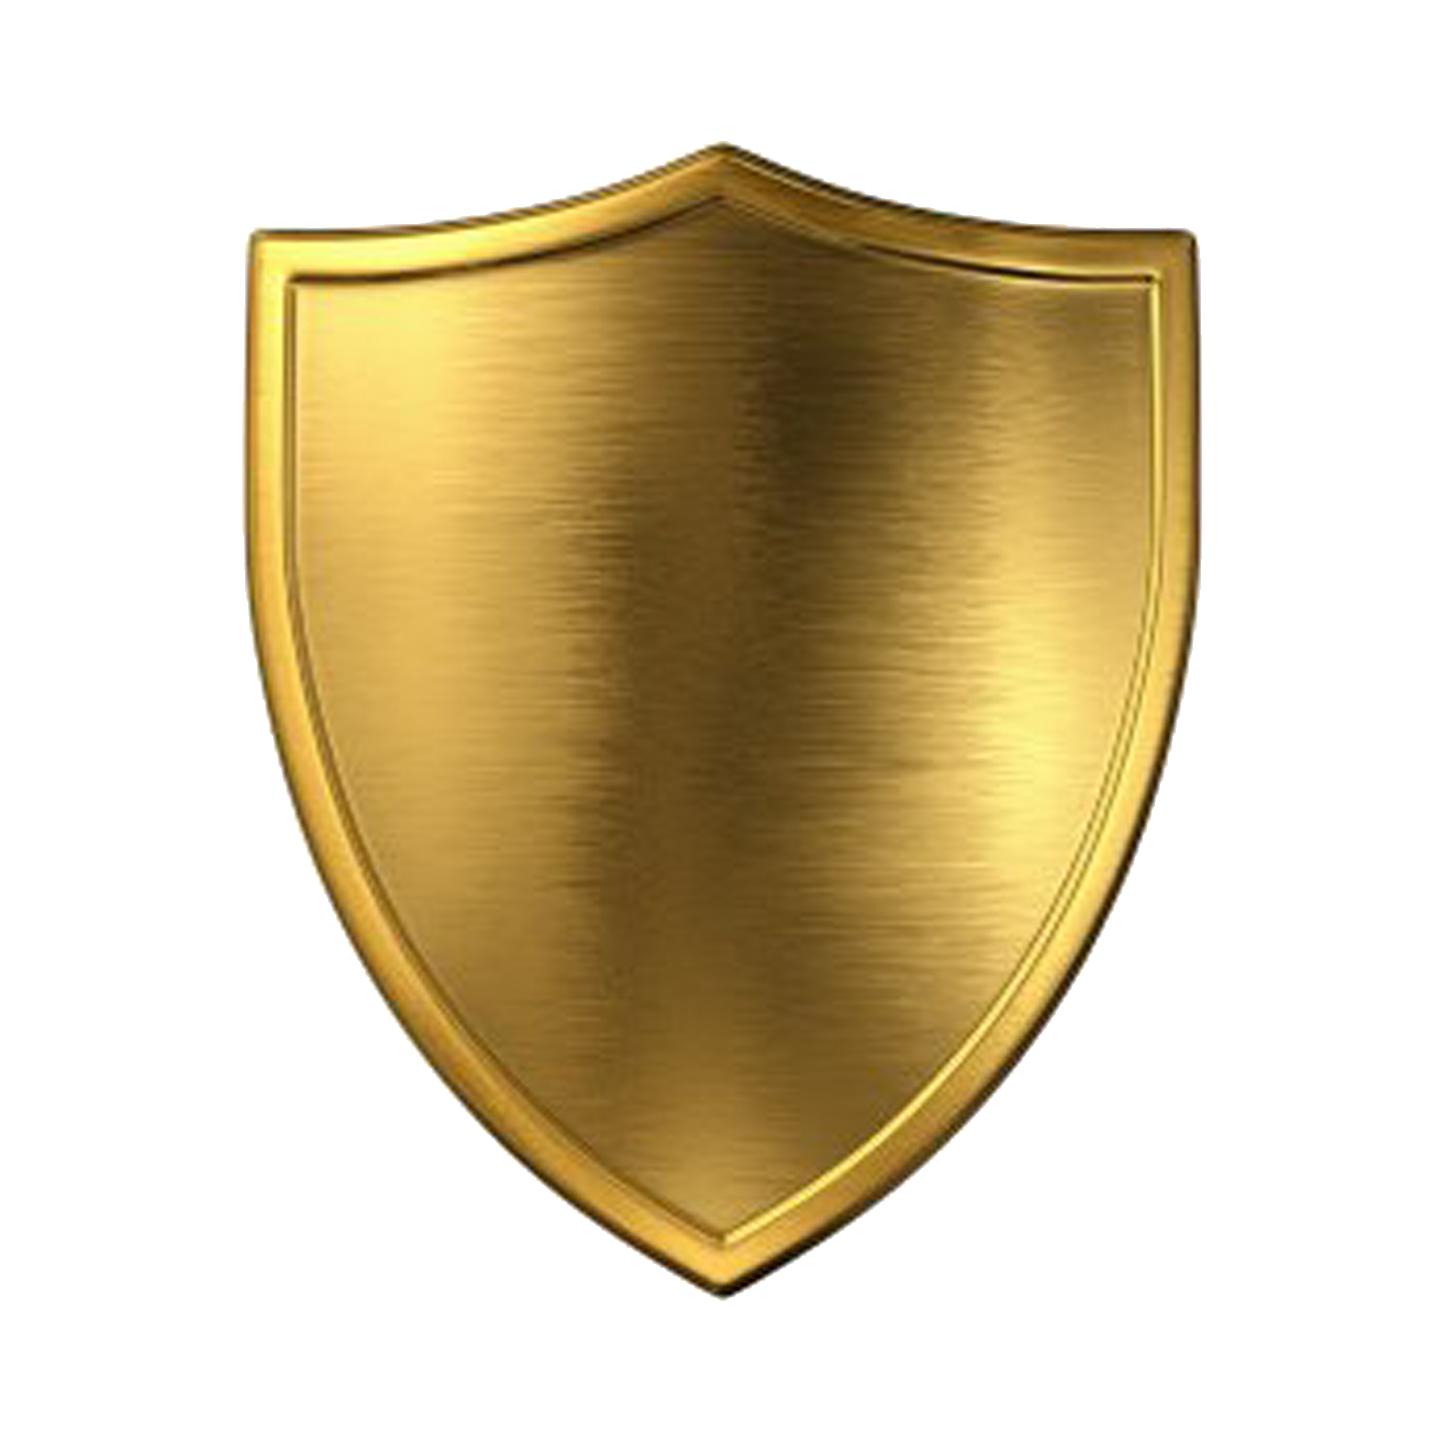 How To Craft Shield Minecraft